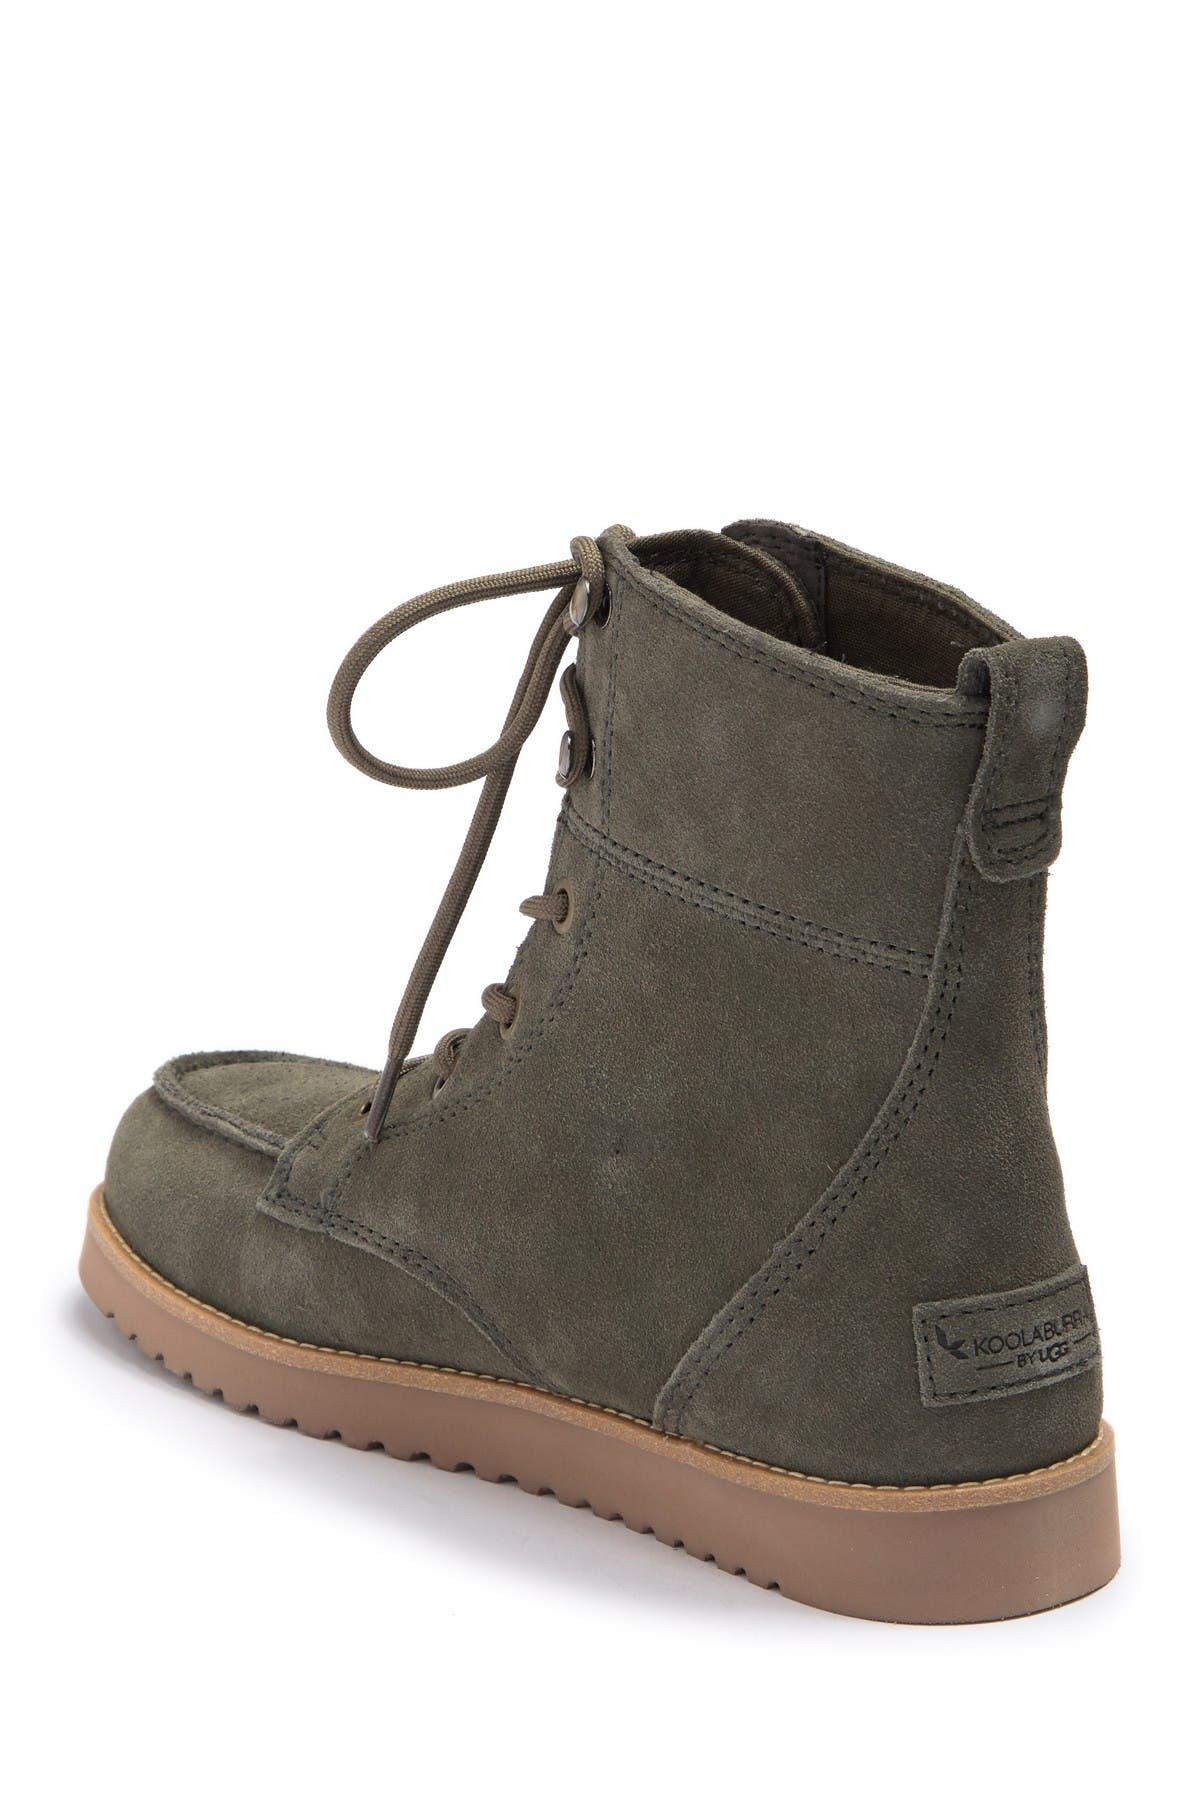 Image of KOOLABURRA BY UGG Neston Suede Lace Up Boot